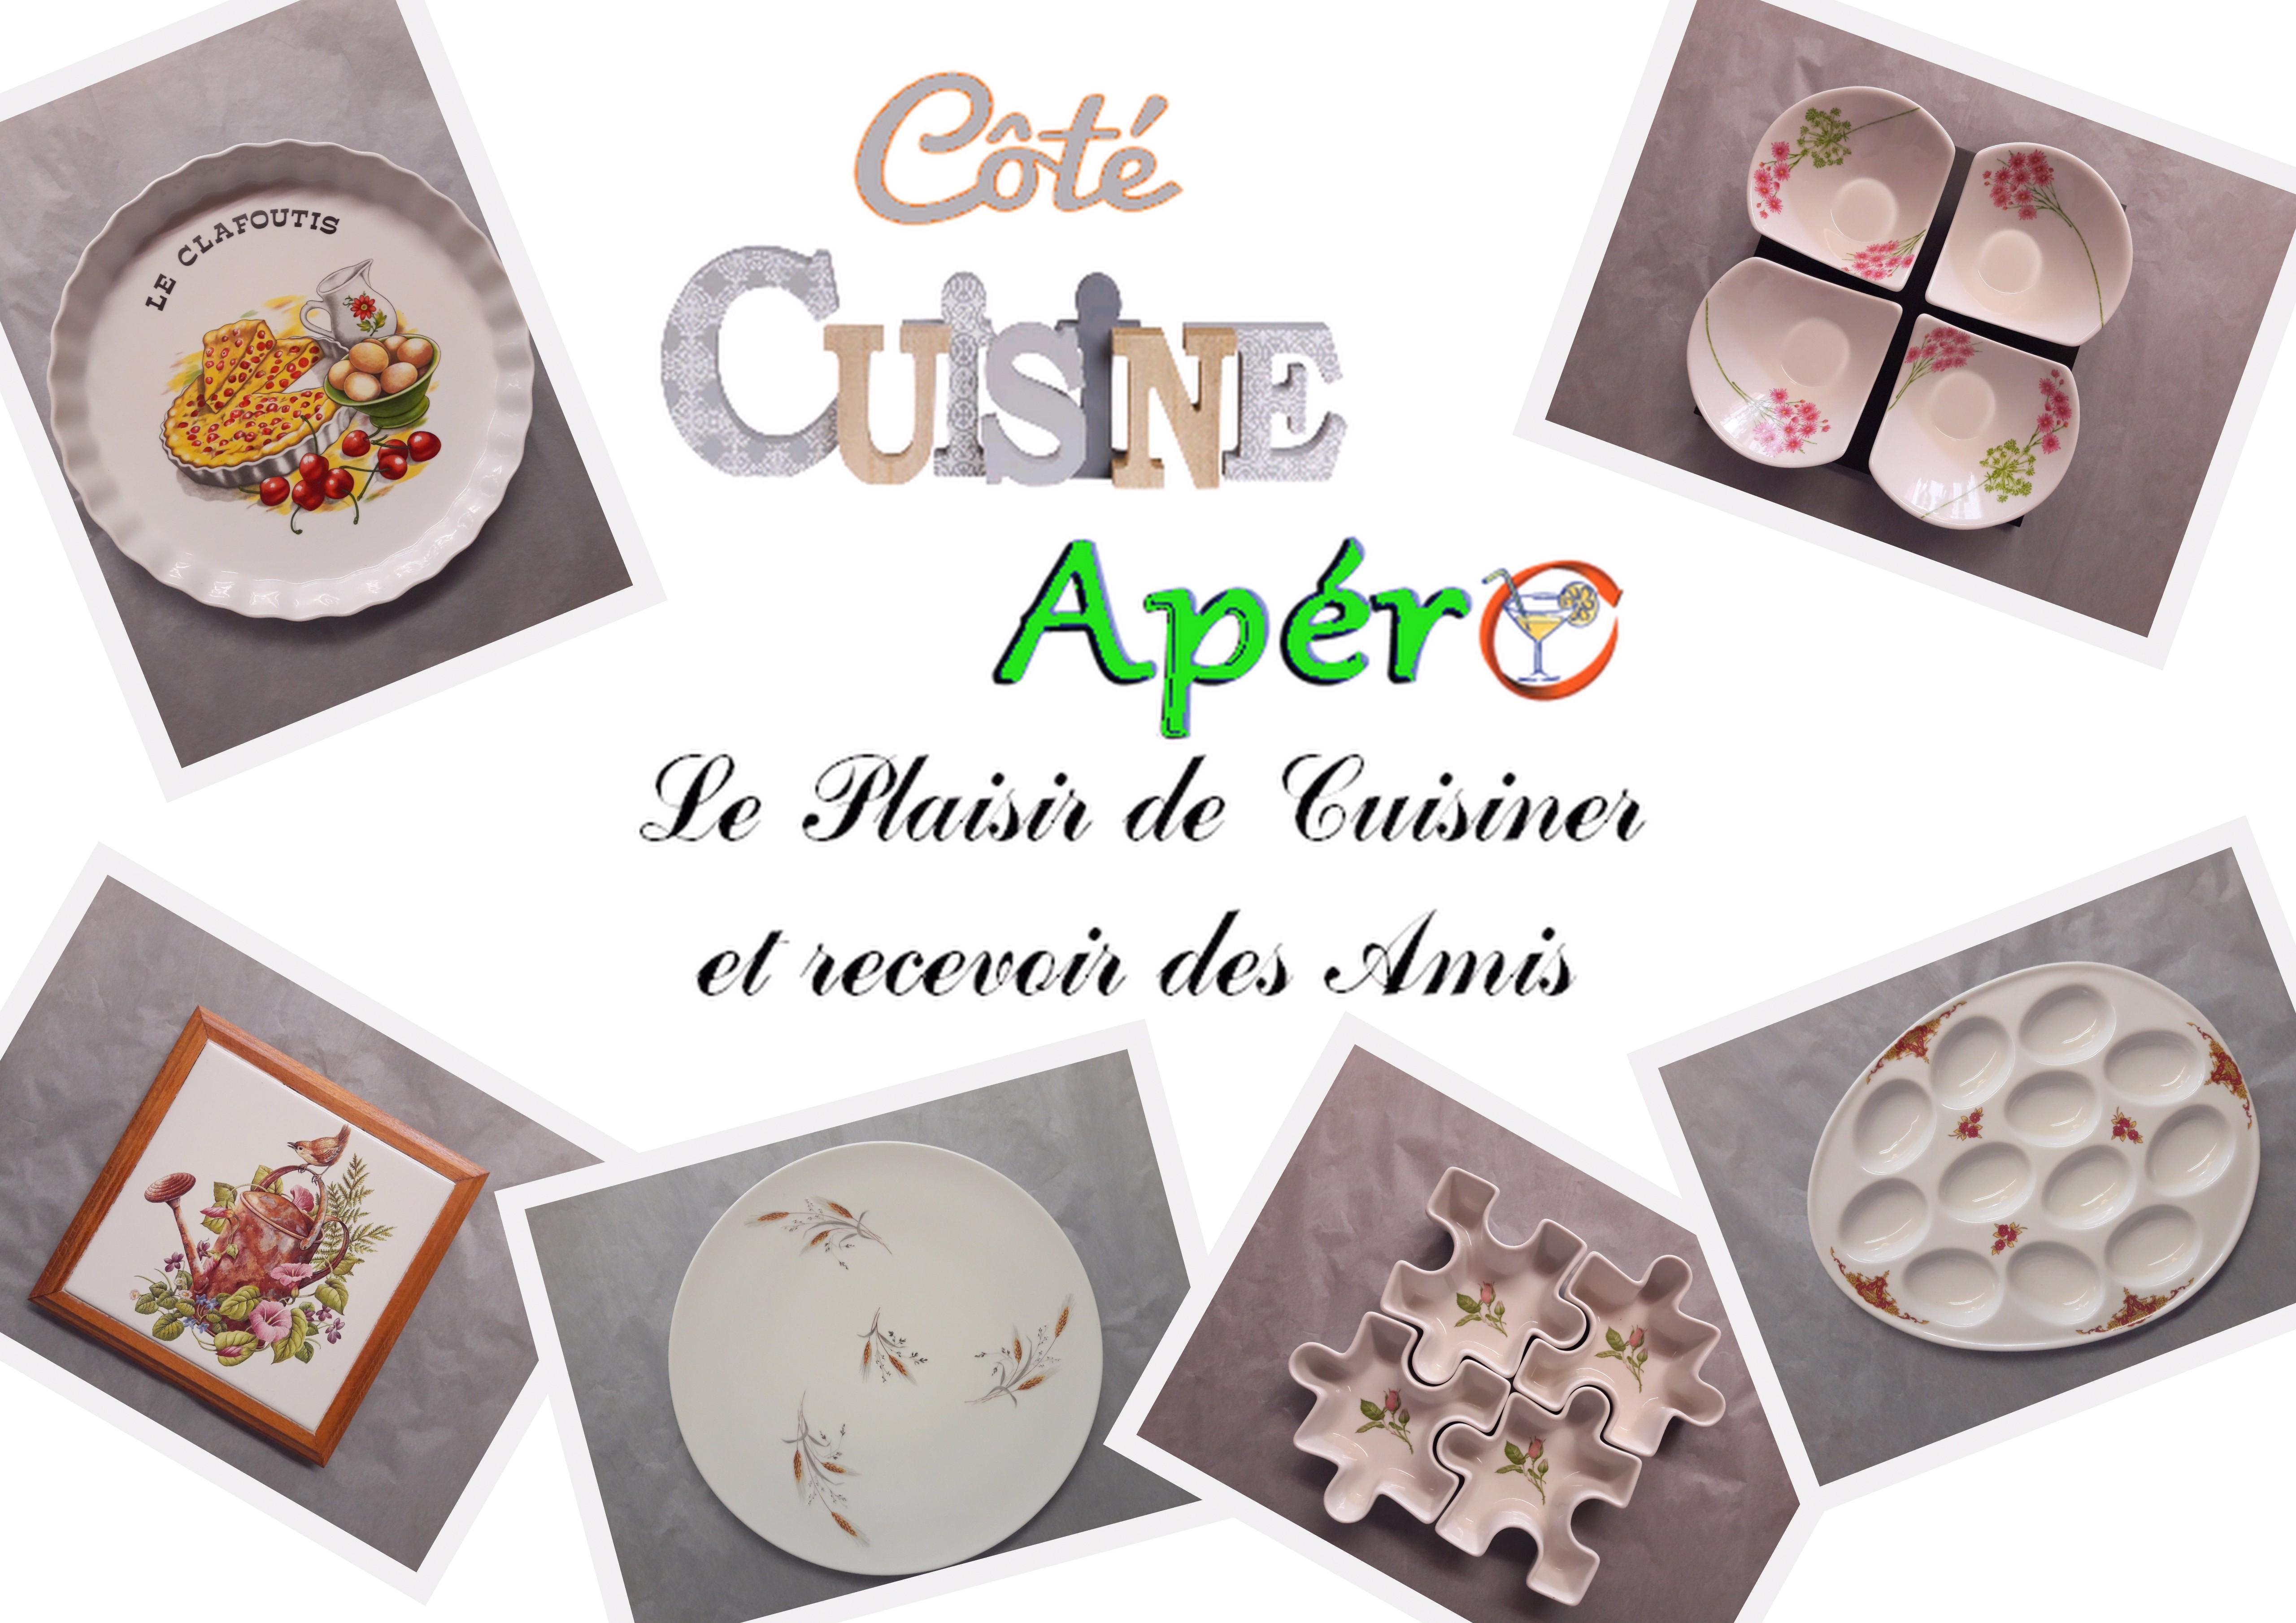 Côté Cuisine & Apéro